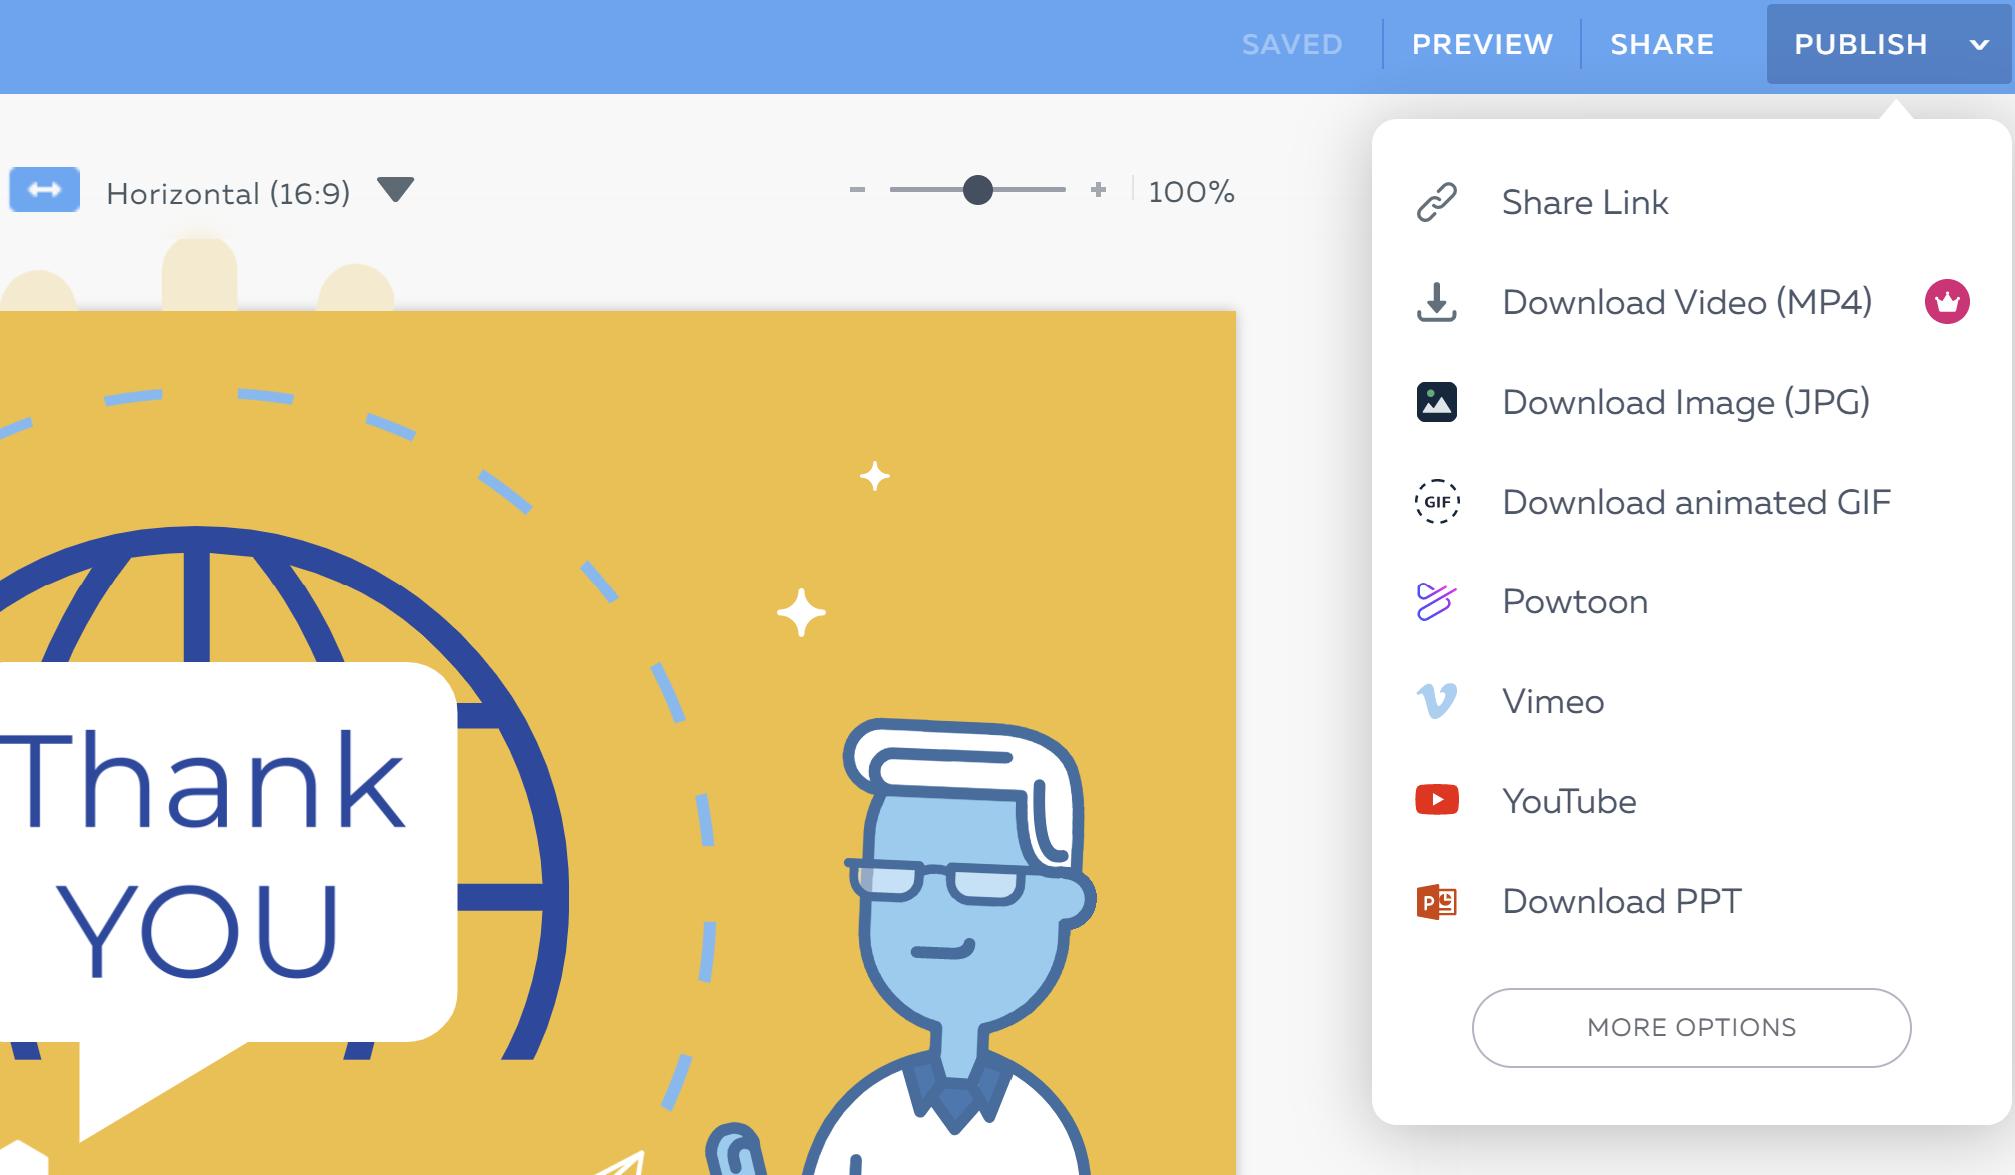 powtoon-integrated-share